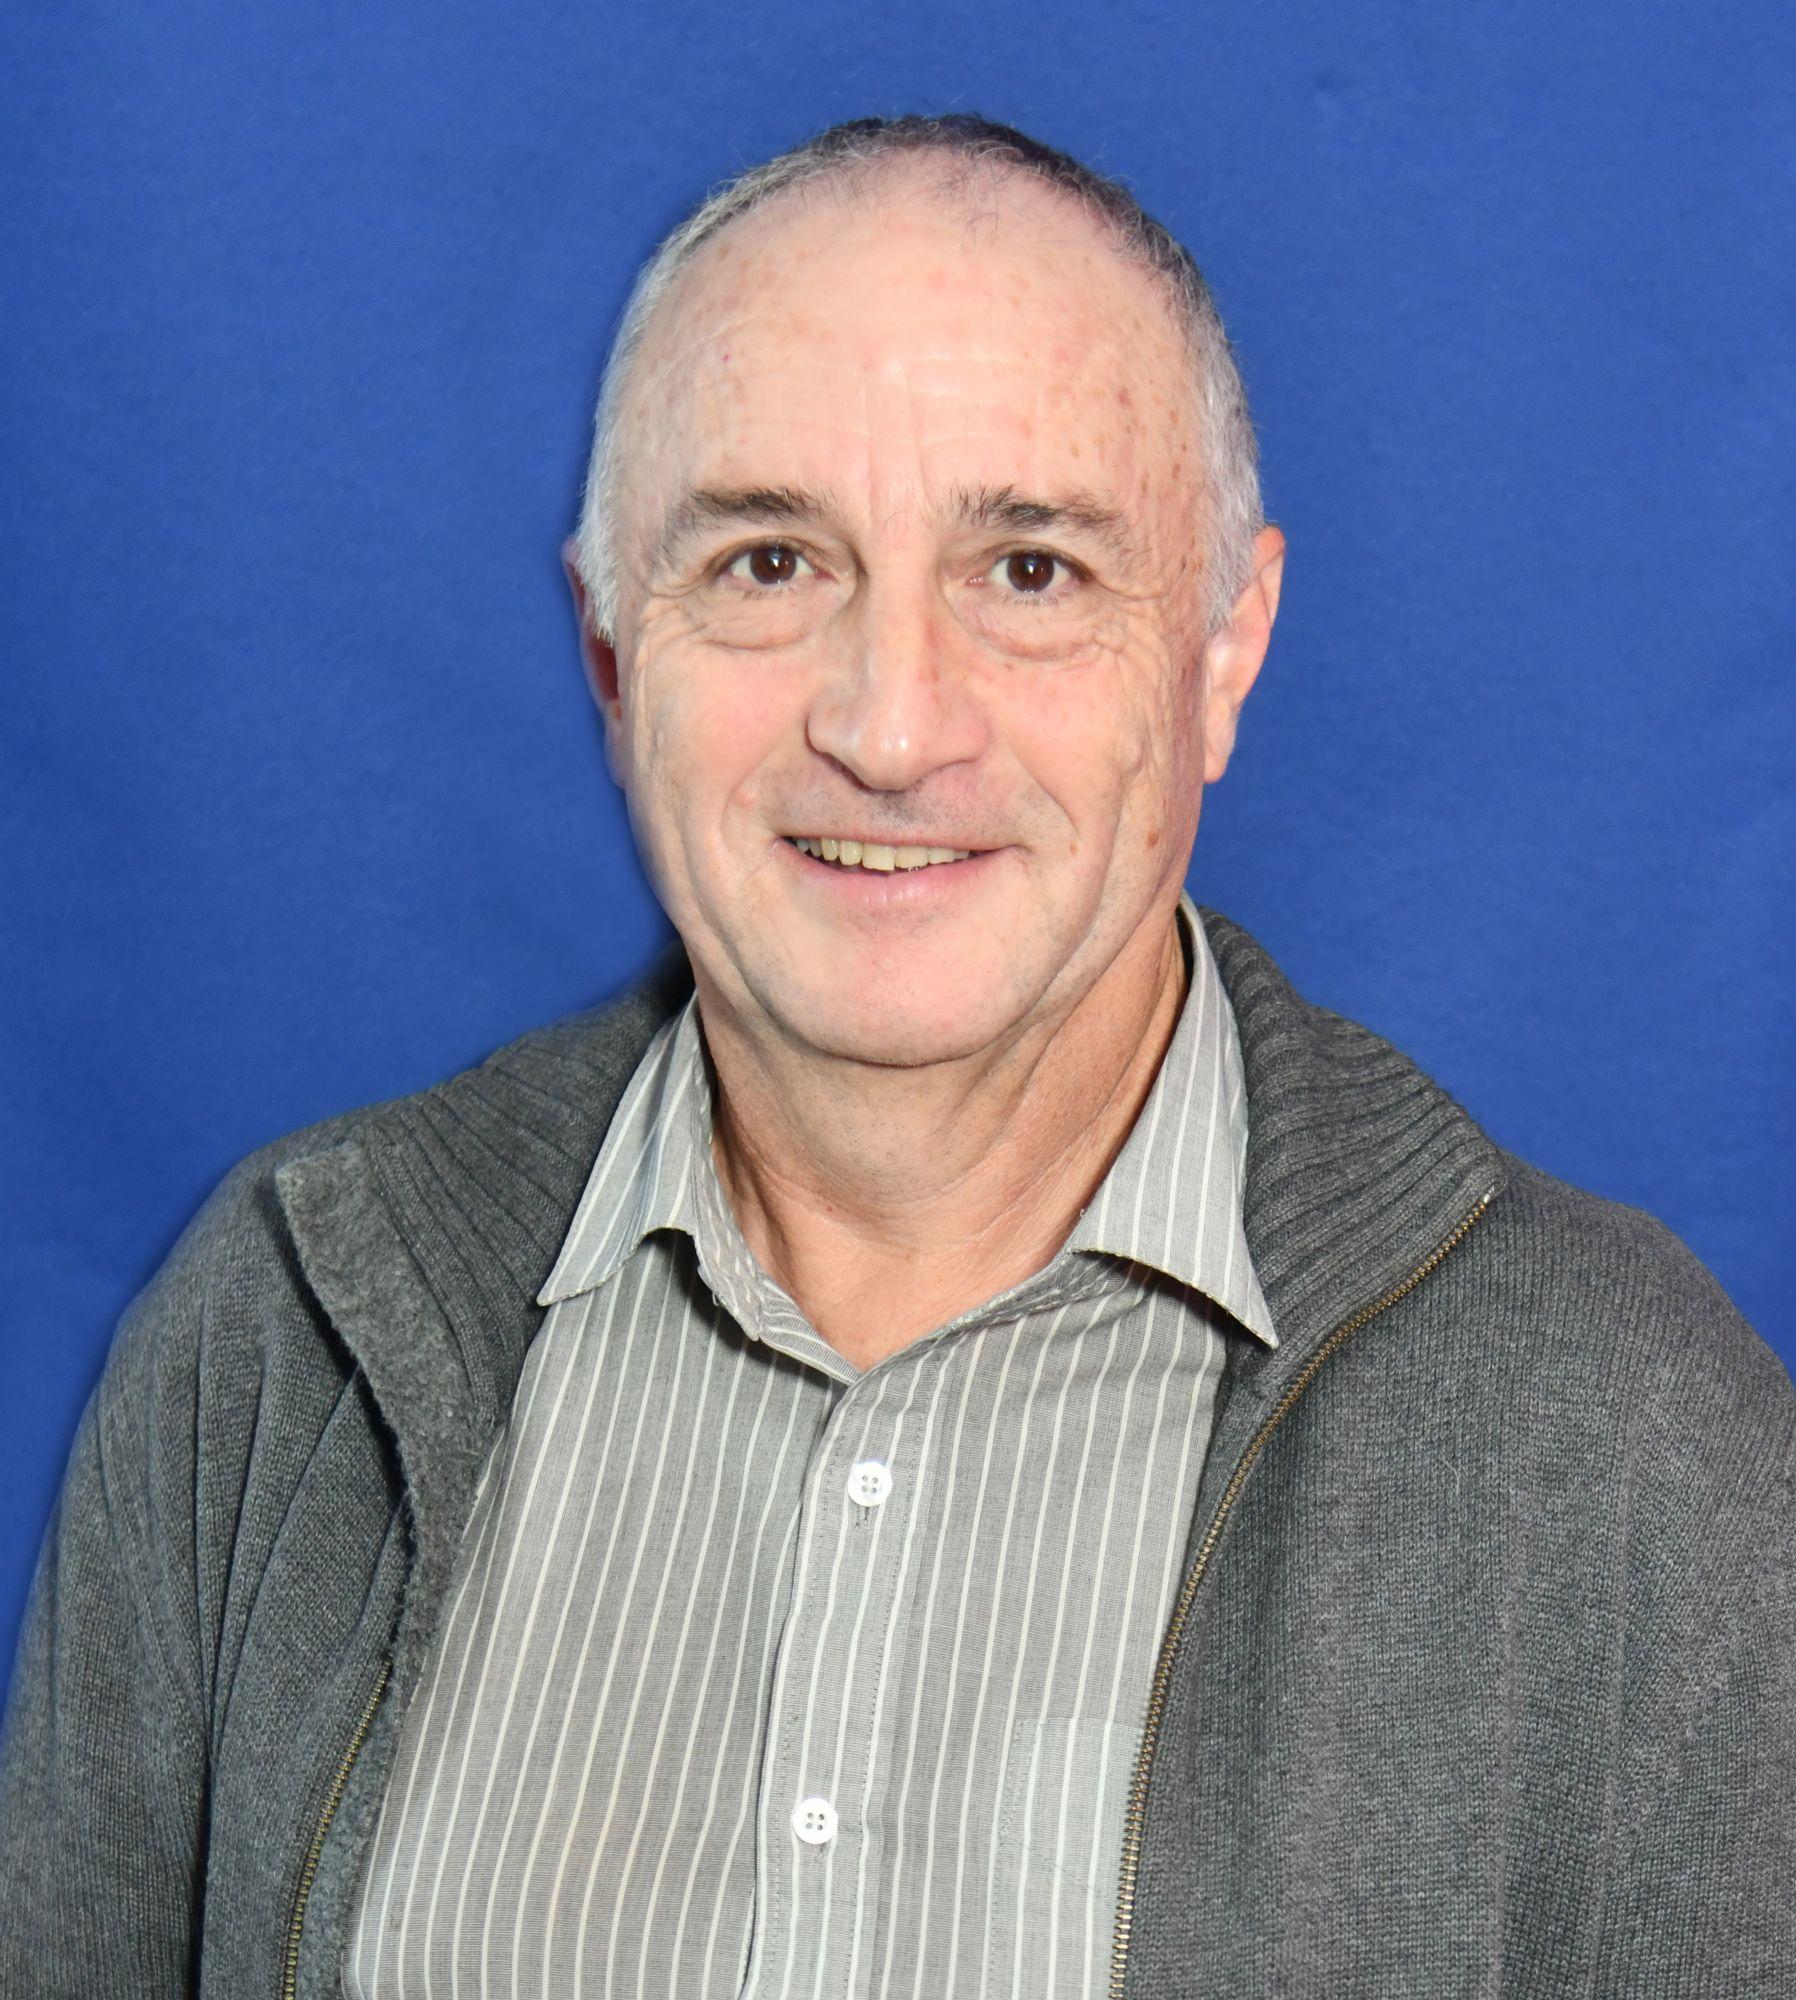 Bernard LE MEUR, Adjoint au Maire